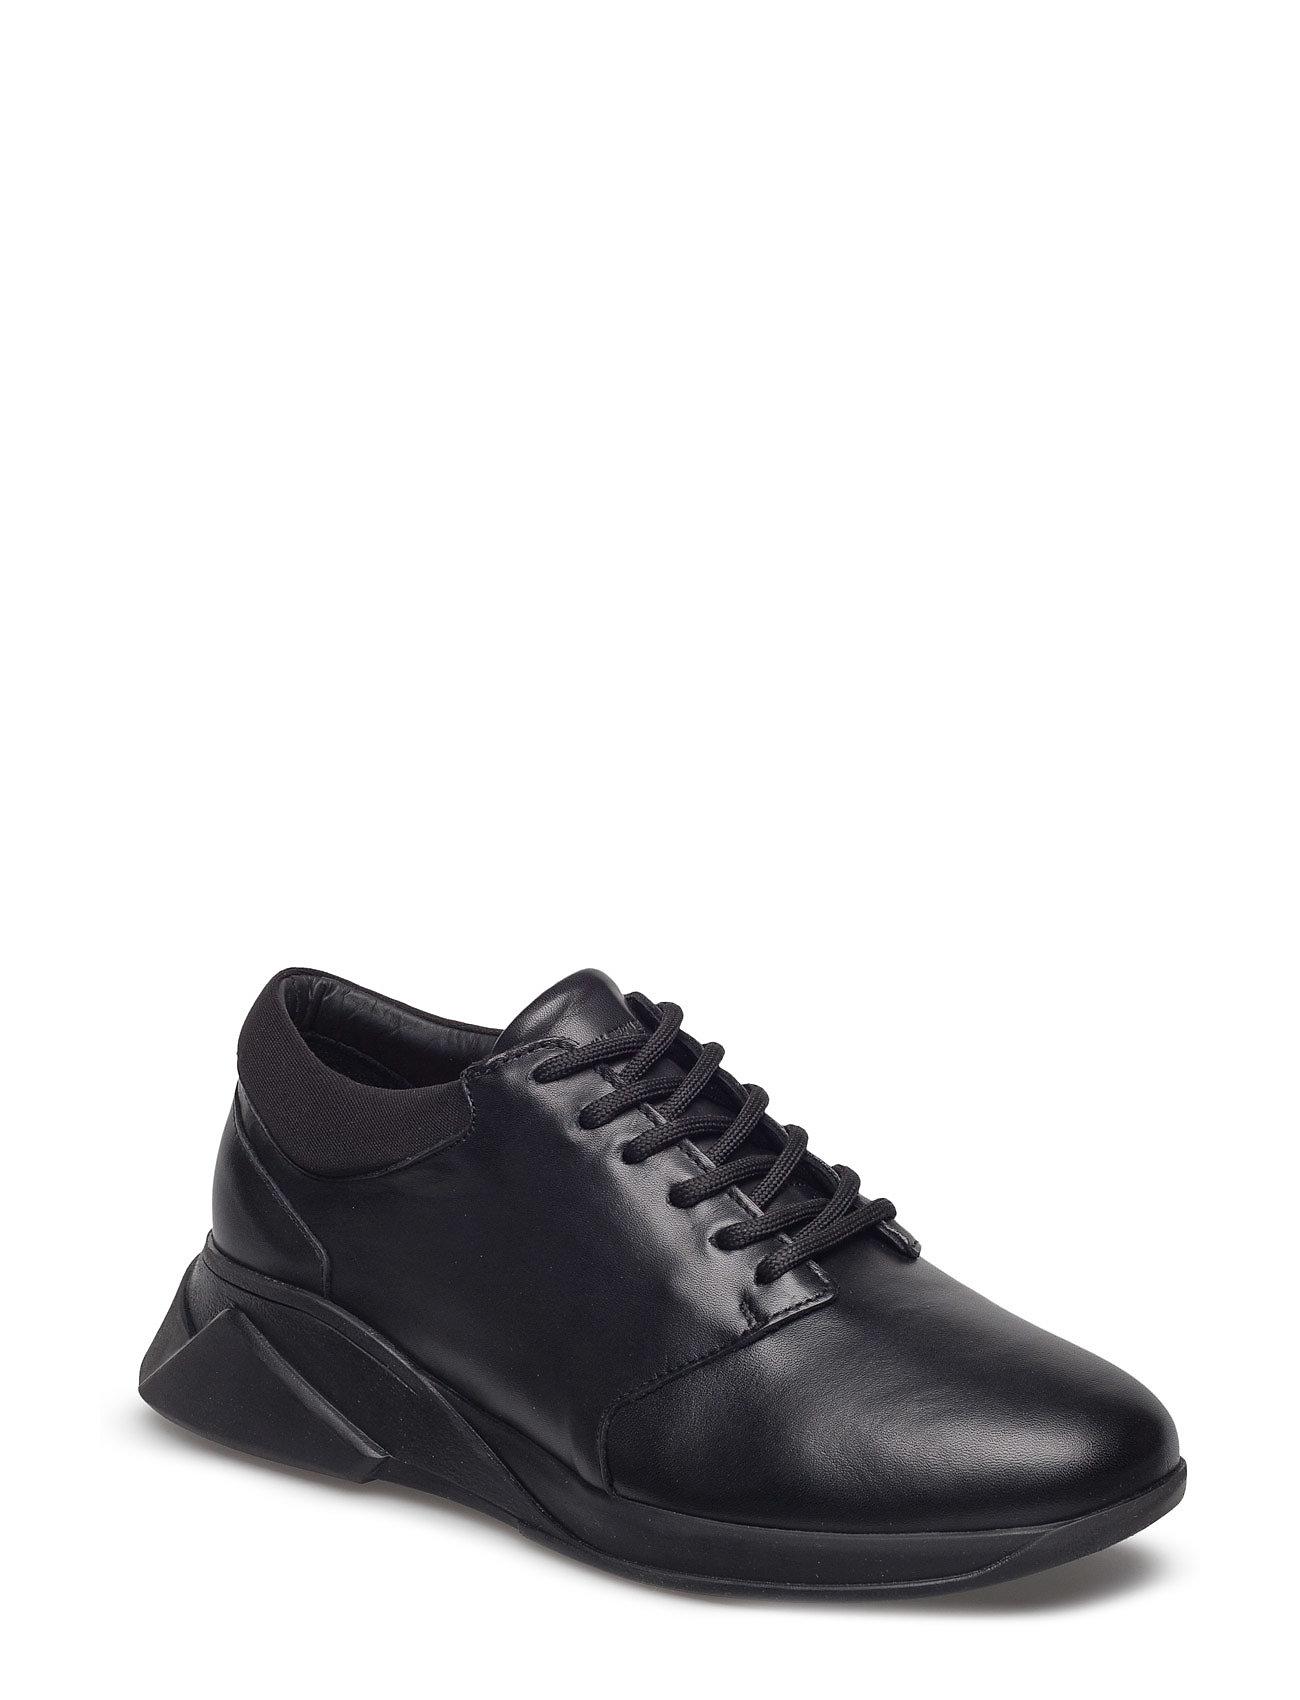 Image of Force Derby Shoe Wmn Low-top Sneakers Sort Royal RepubliQ (2646576317)